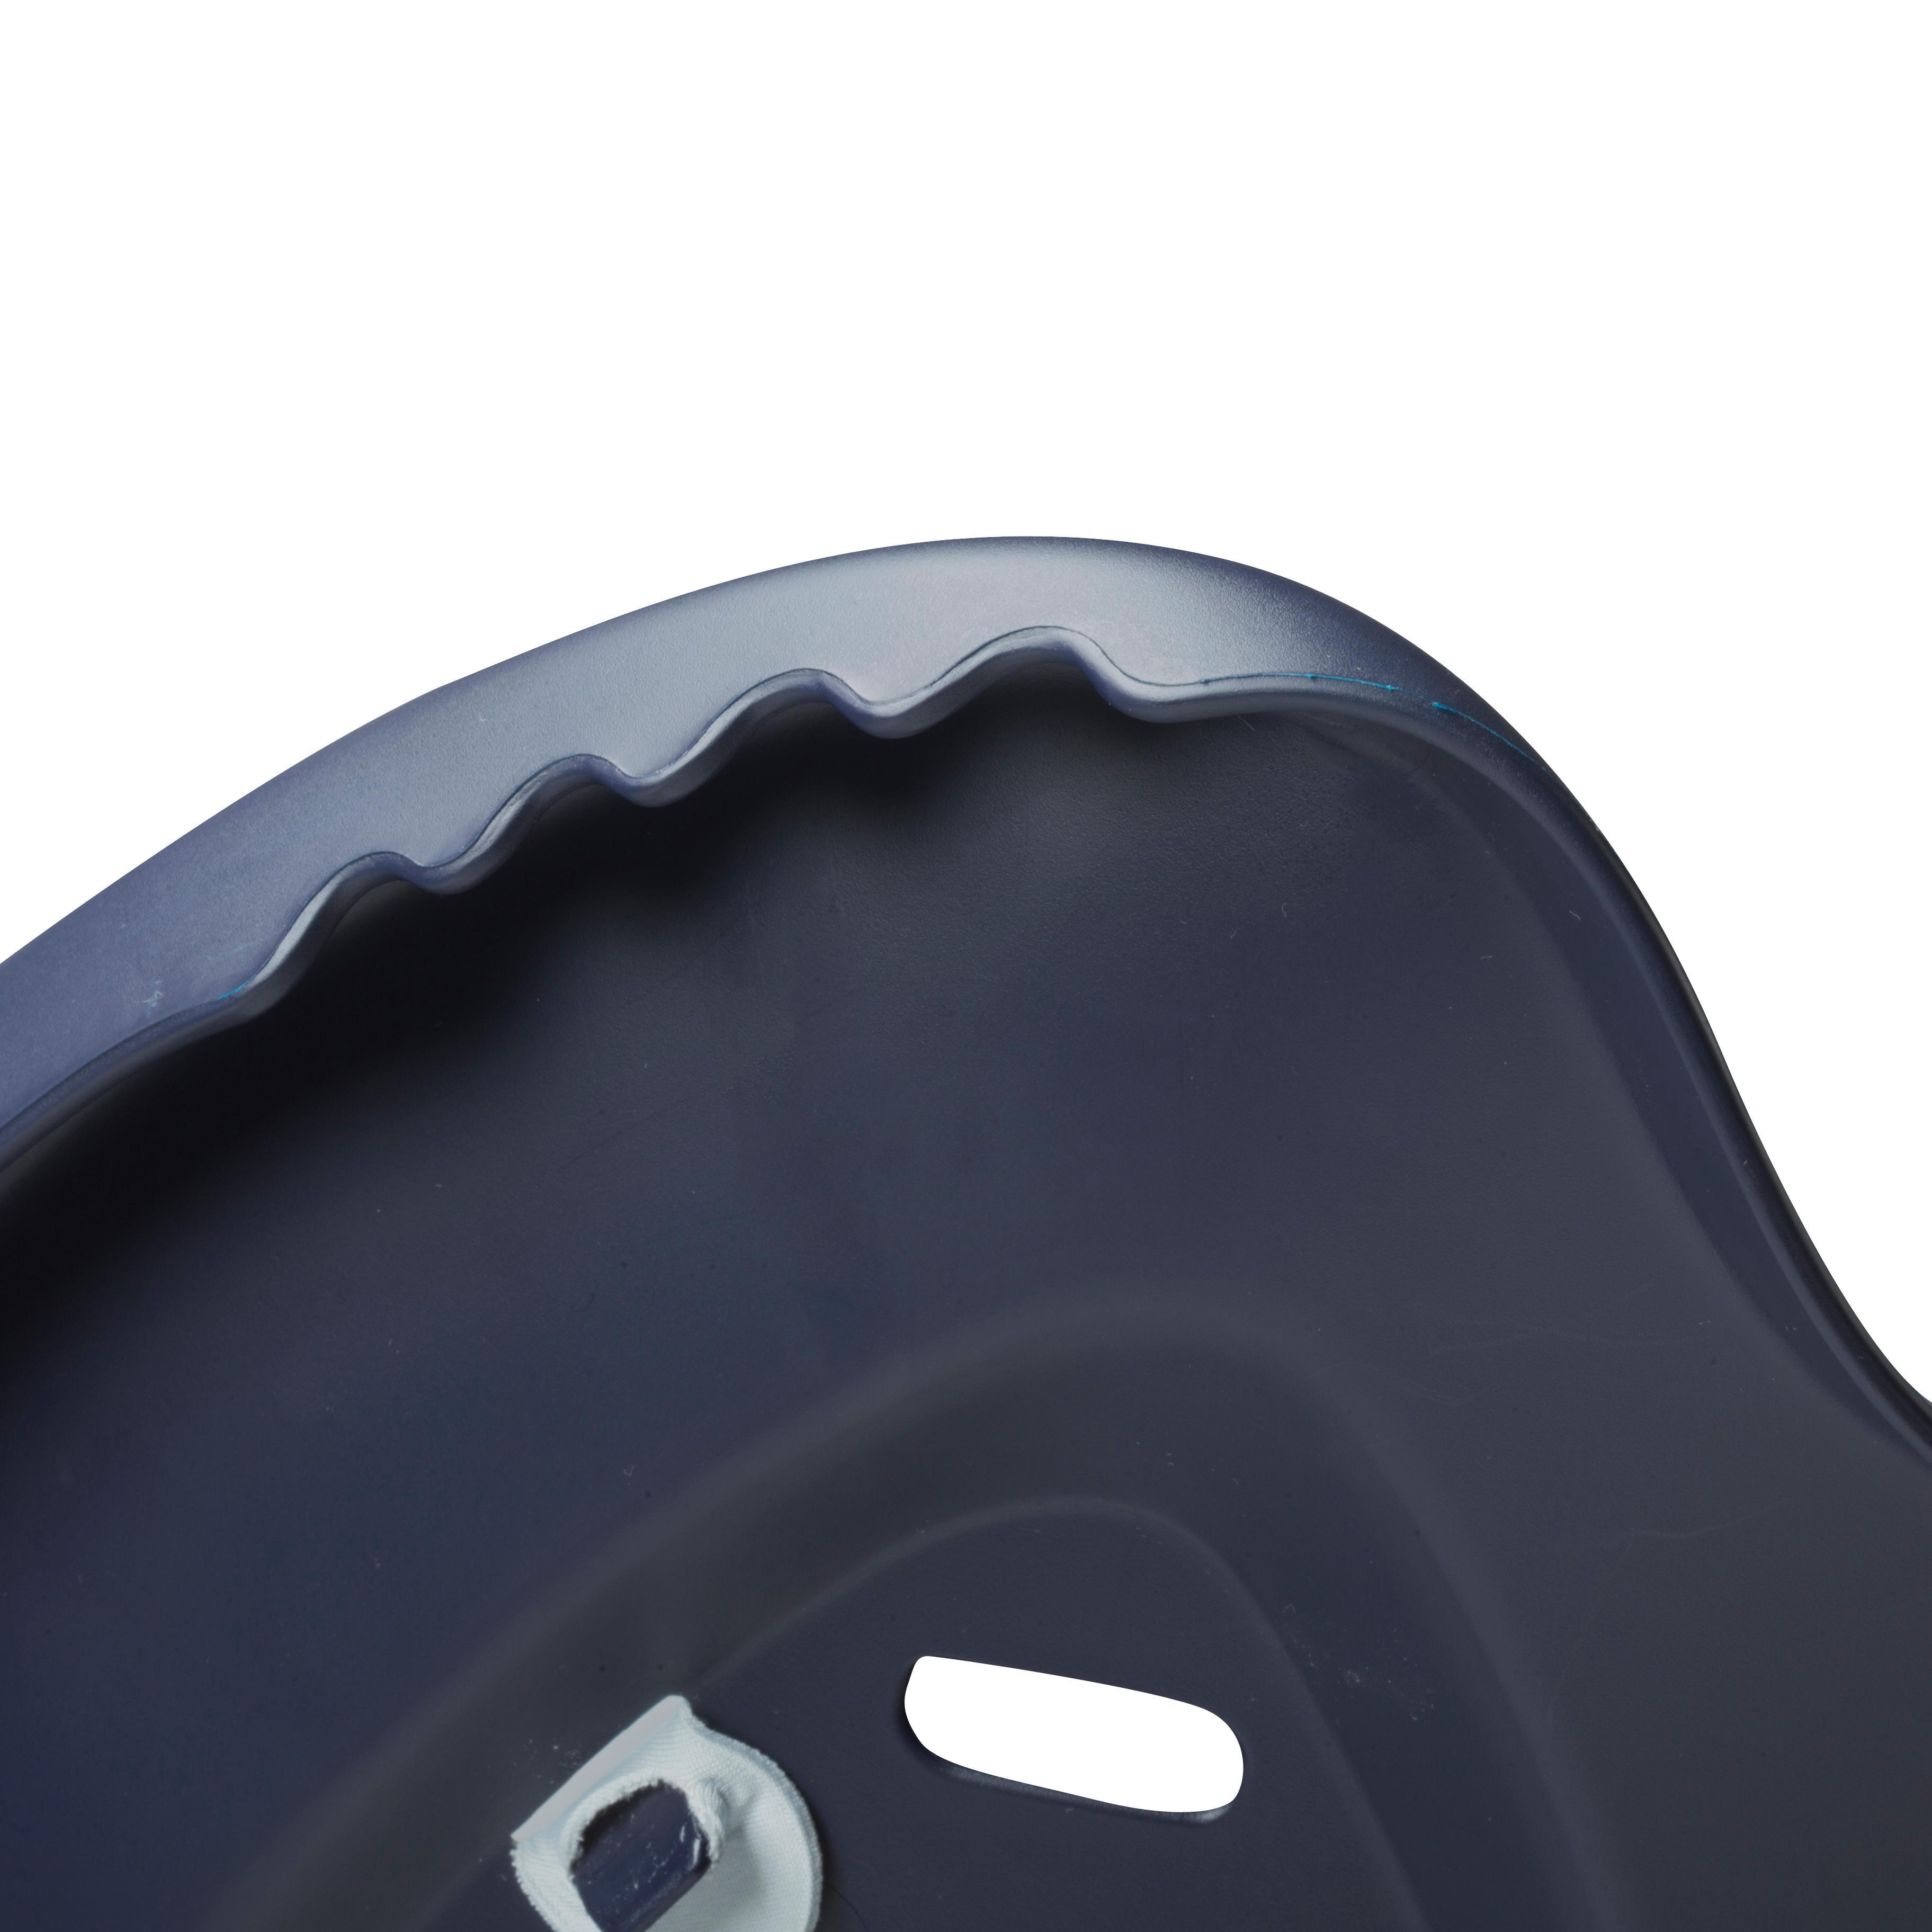 500 B'Clip Bike Baby Seat - Blue